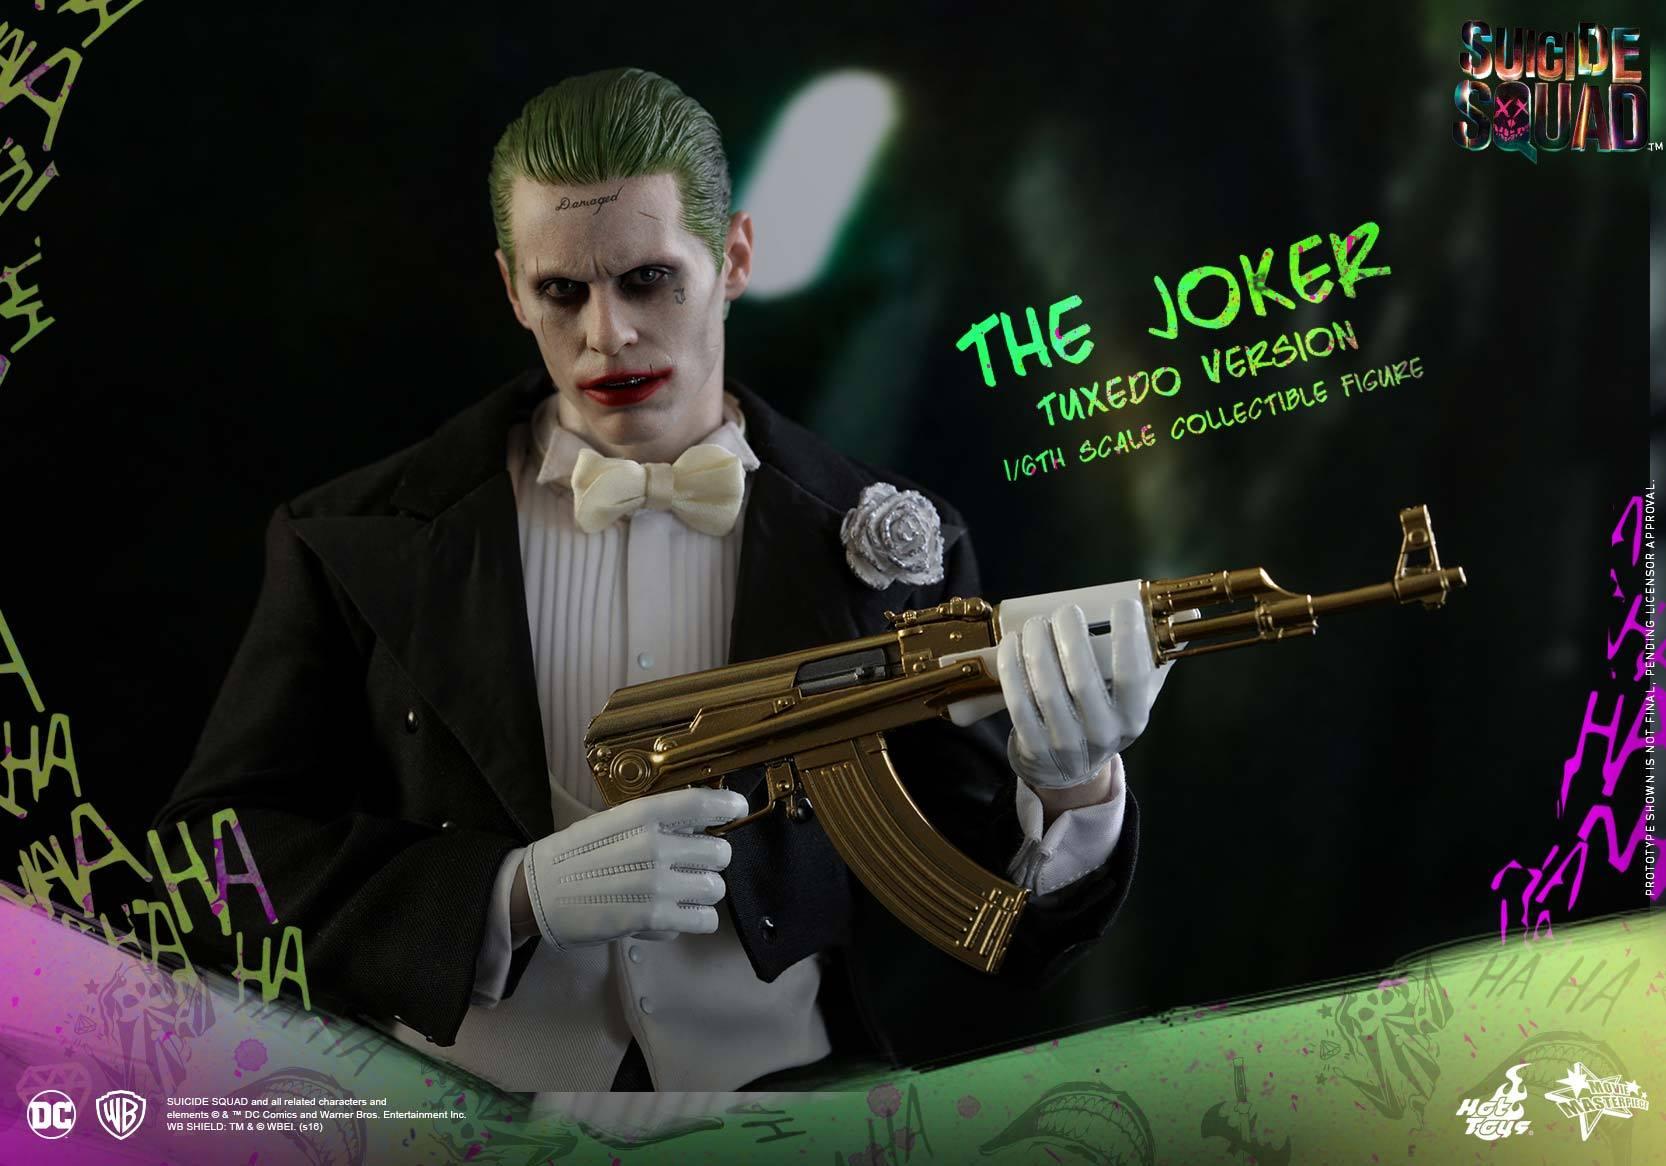 Hot Toys Suicide Squad – The Joker Sixth Scale Figure Tuxedo Version